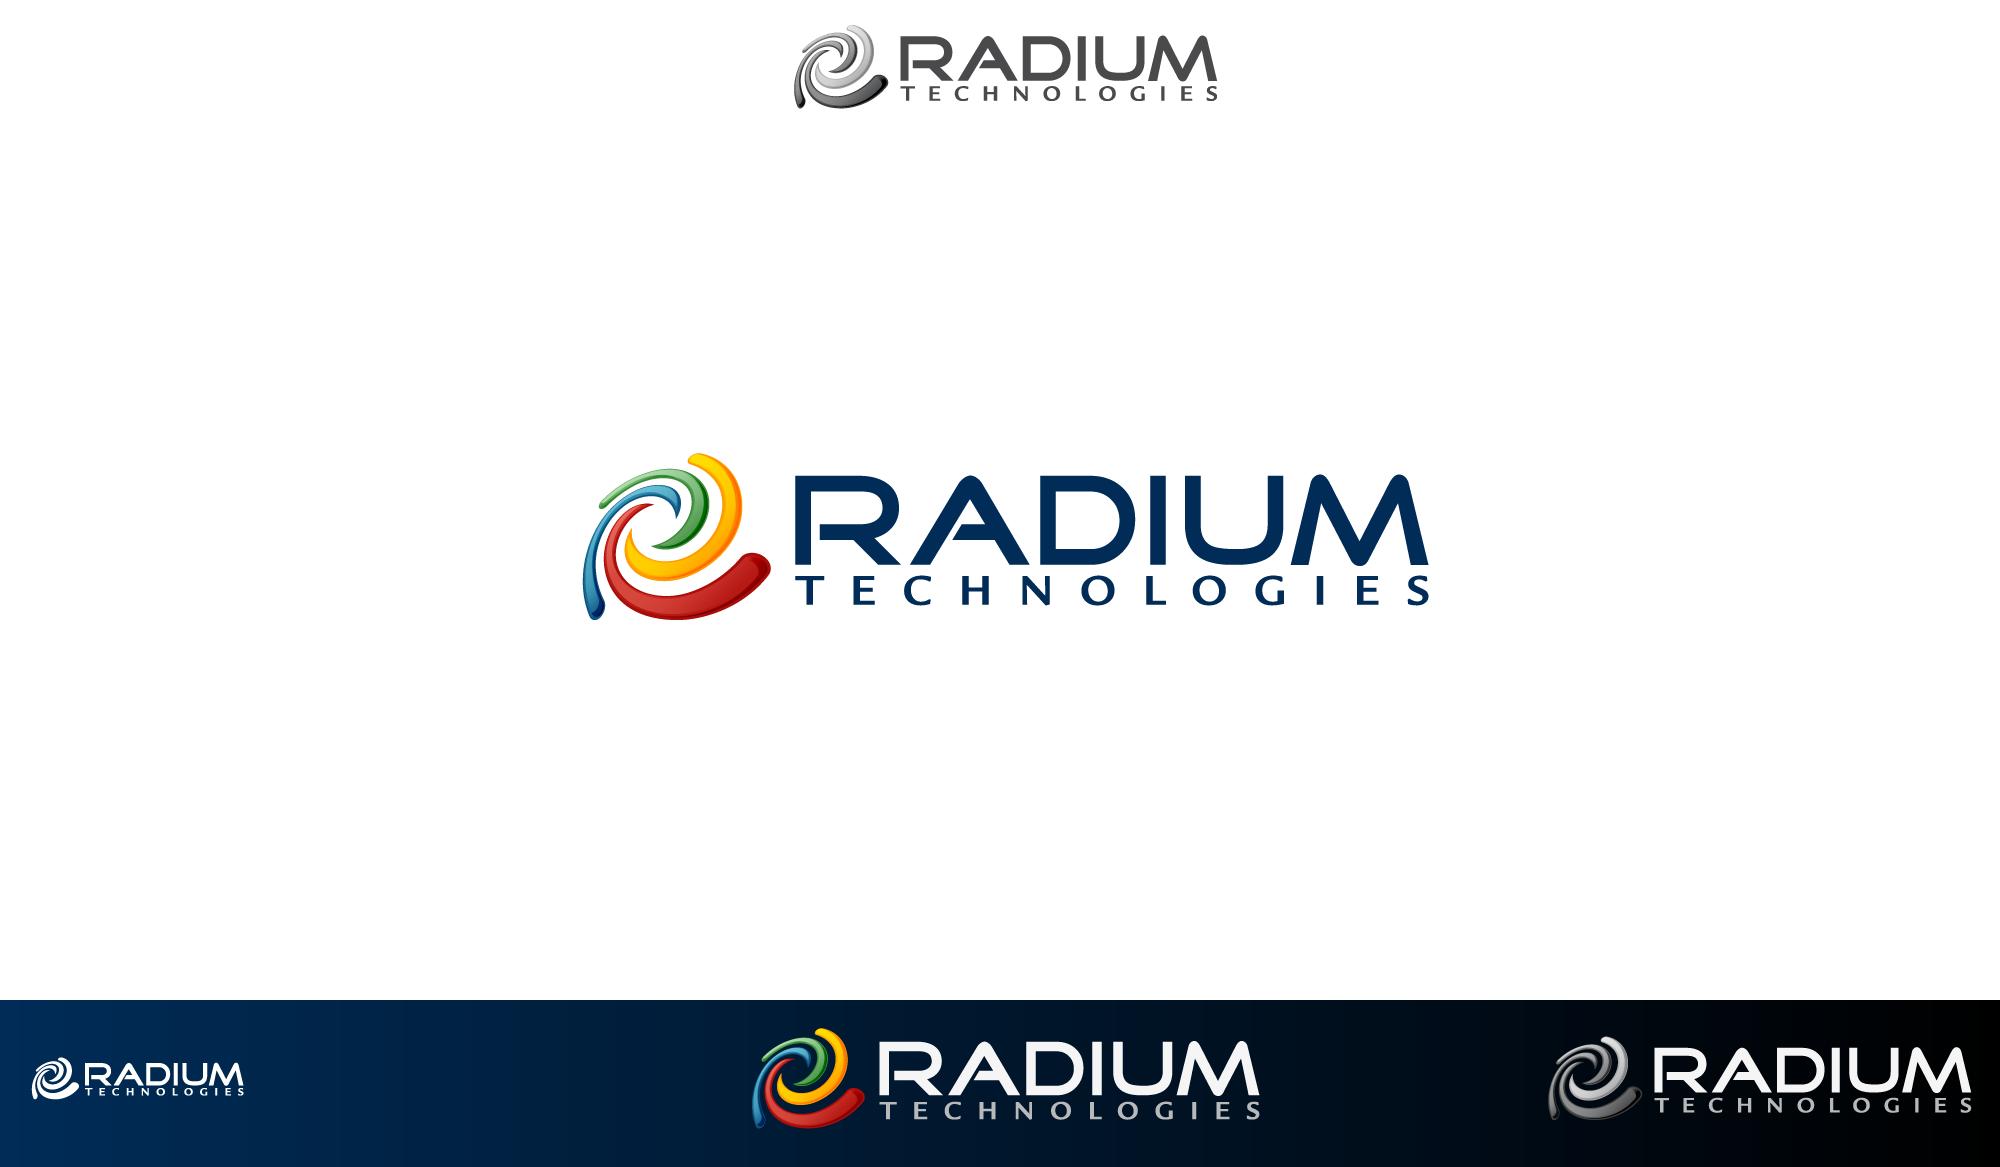 Software development company needs a new logo